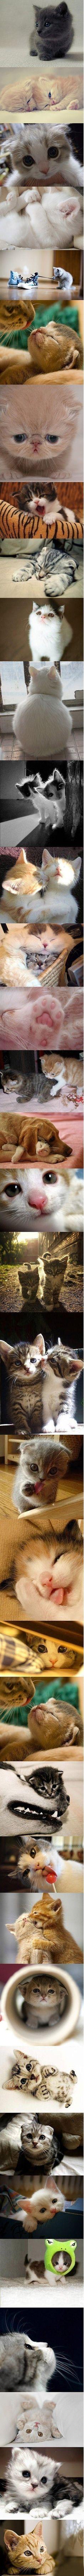 awww, cats, anim, pet, ador, kittens, kitti, kitty, thing